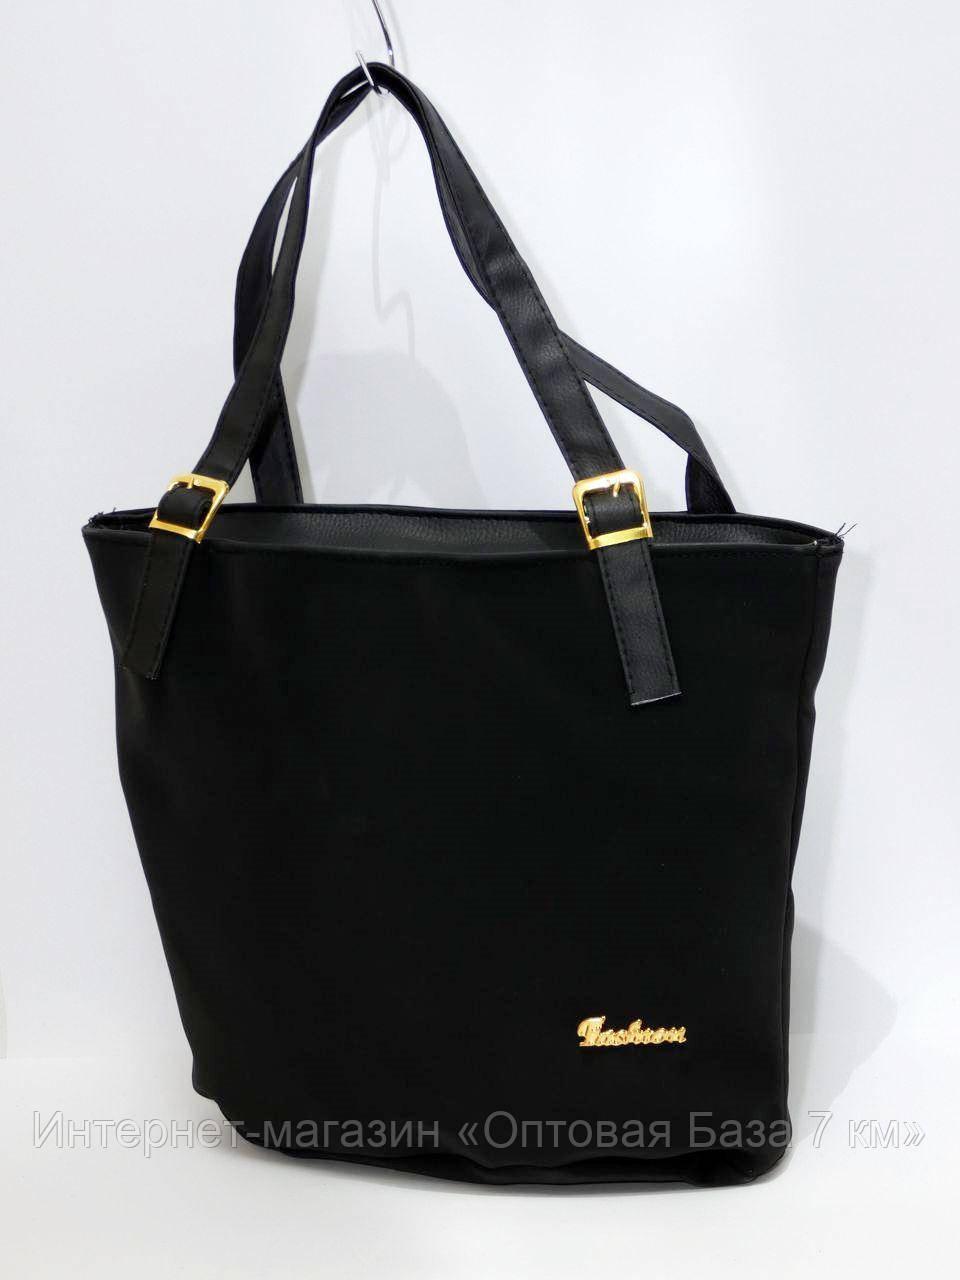 32b119d1c73c Женская сумка (38х30х8), Турция - Интернет-магазин «Оптовая База 7 км